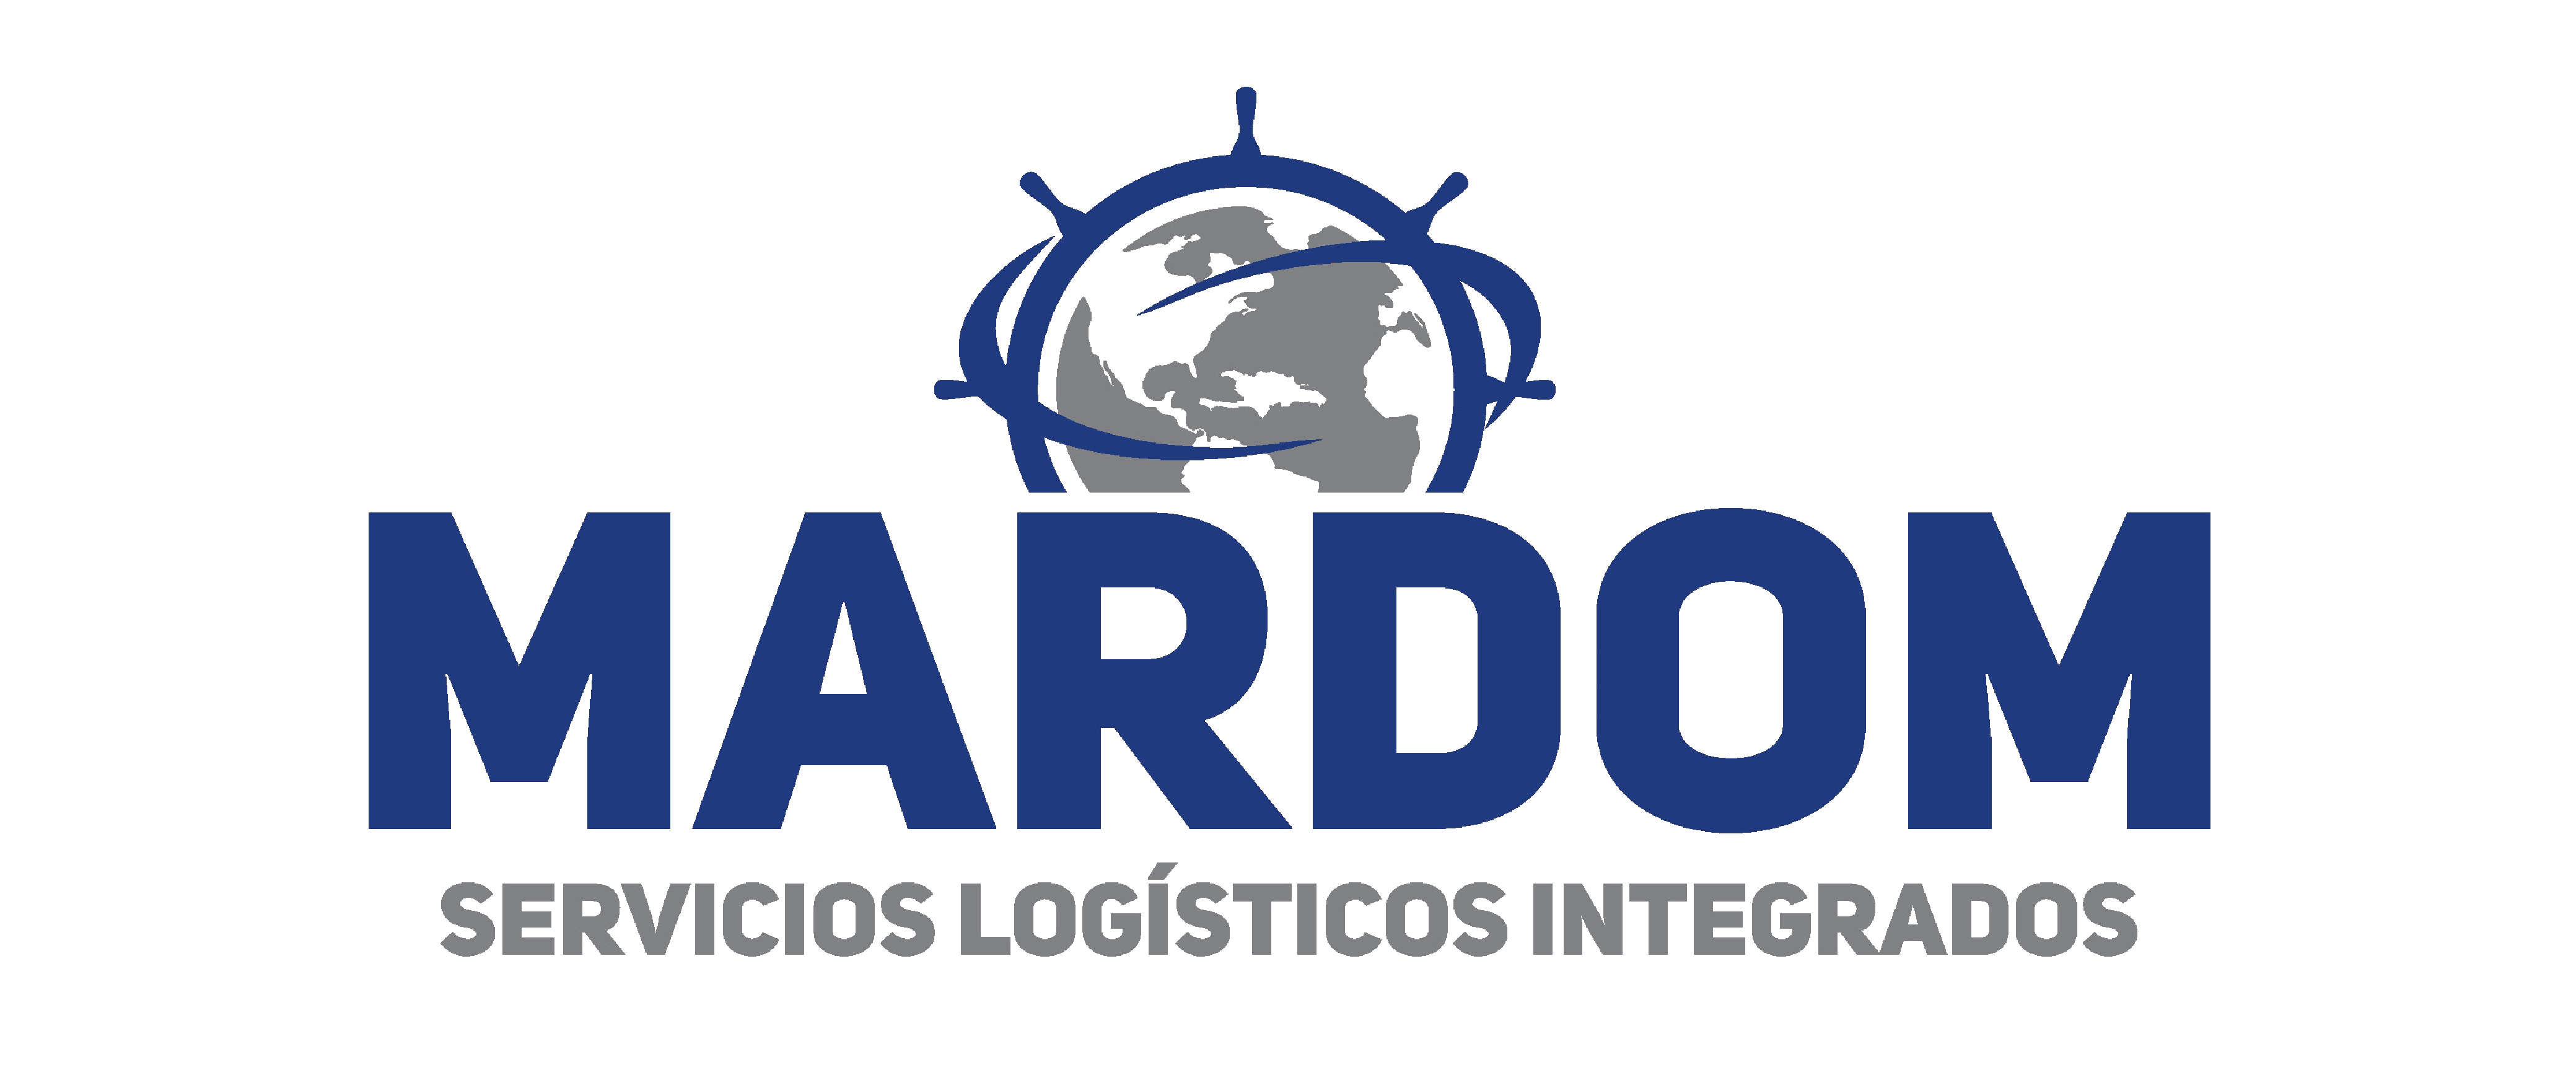 https://0201.nccdn.net/4_2/000/000/03f/ac7/Maritima-Dominicanaa-4158x1735.png